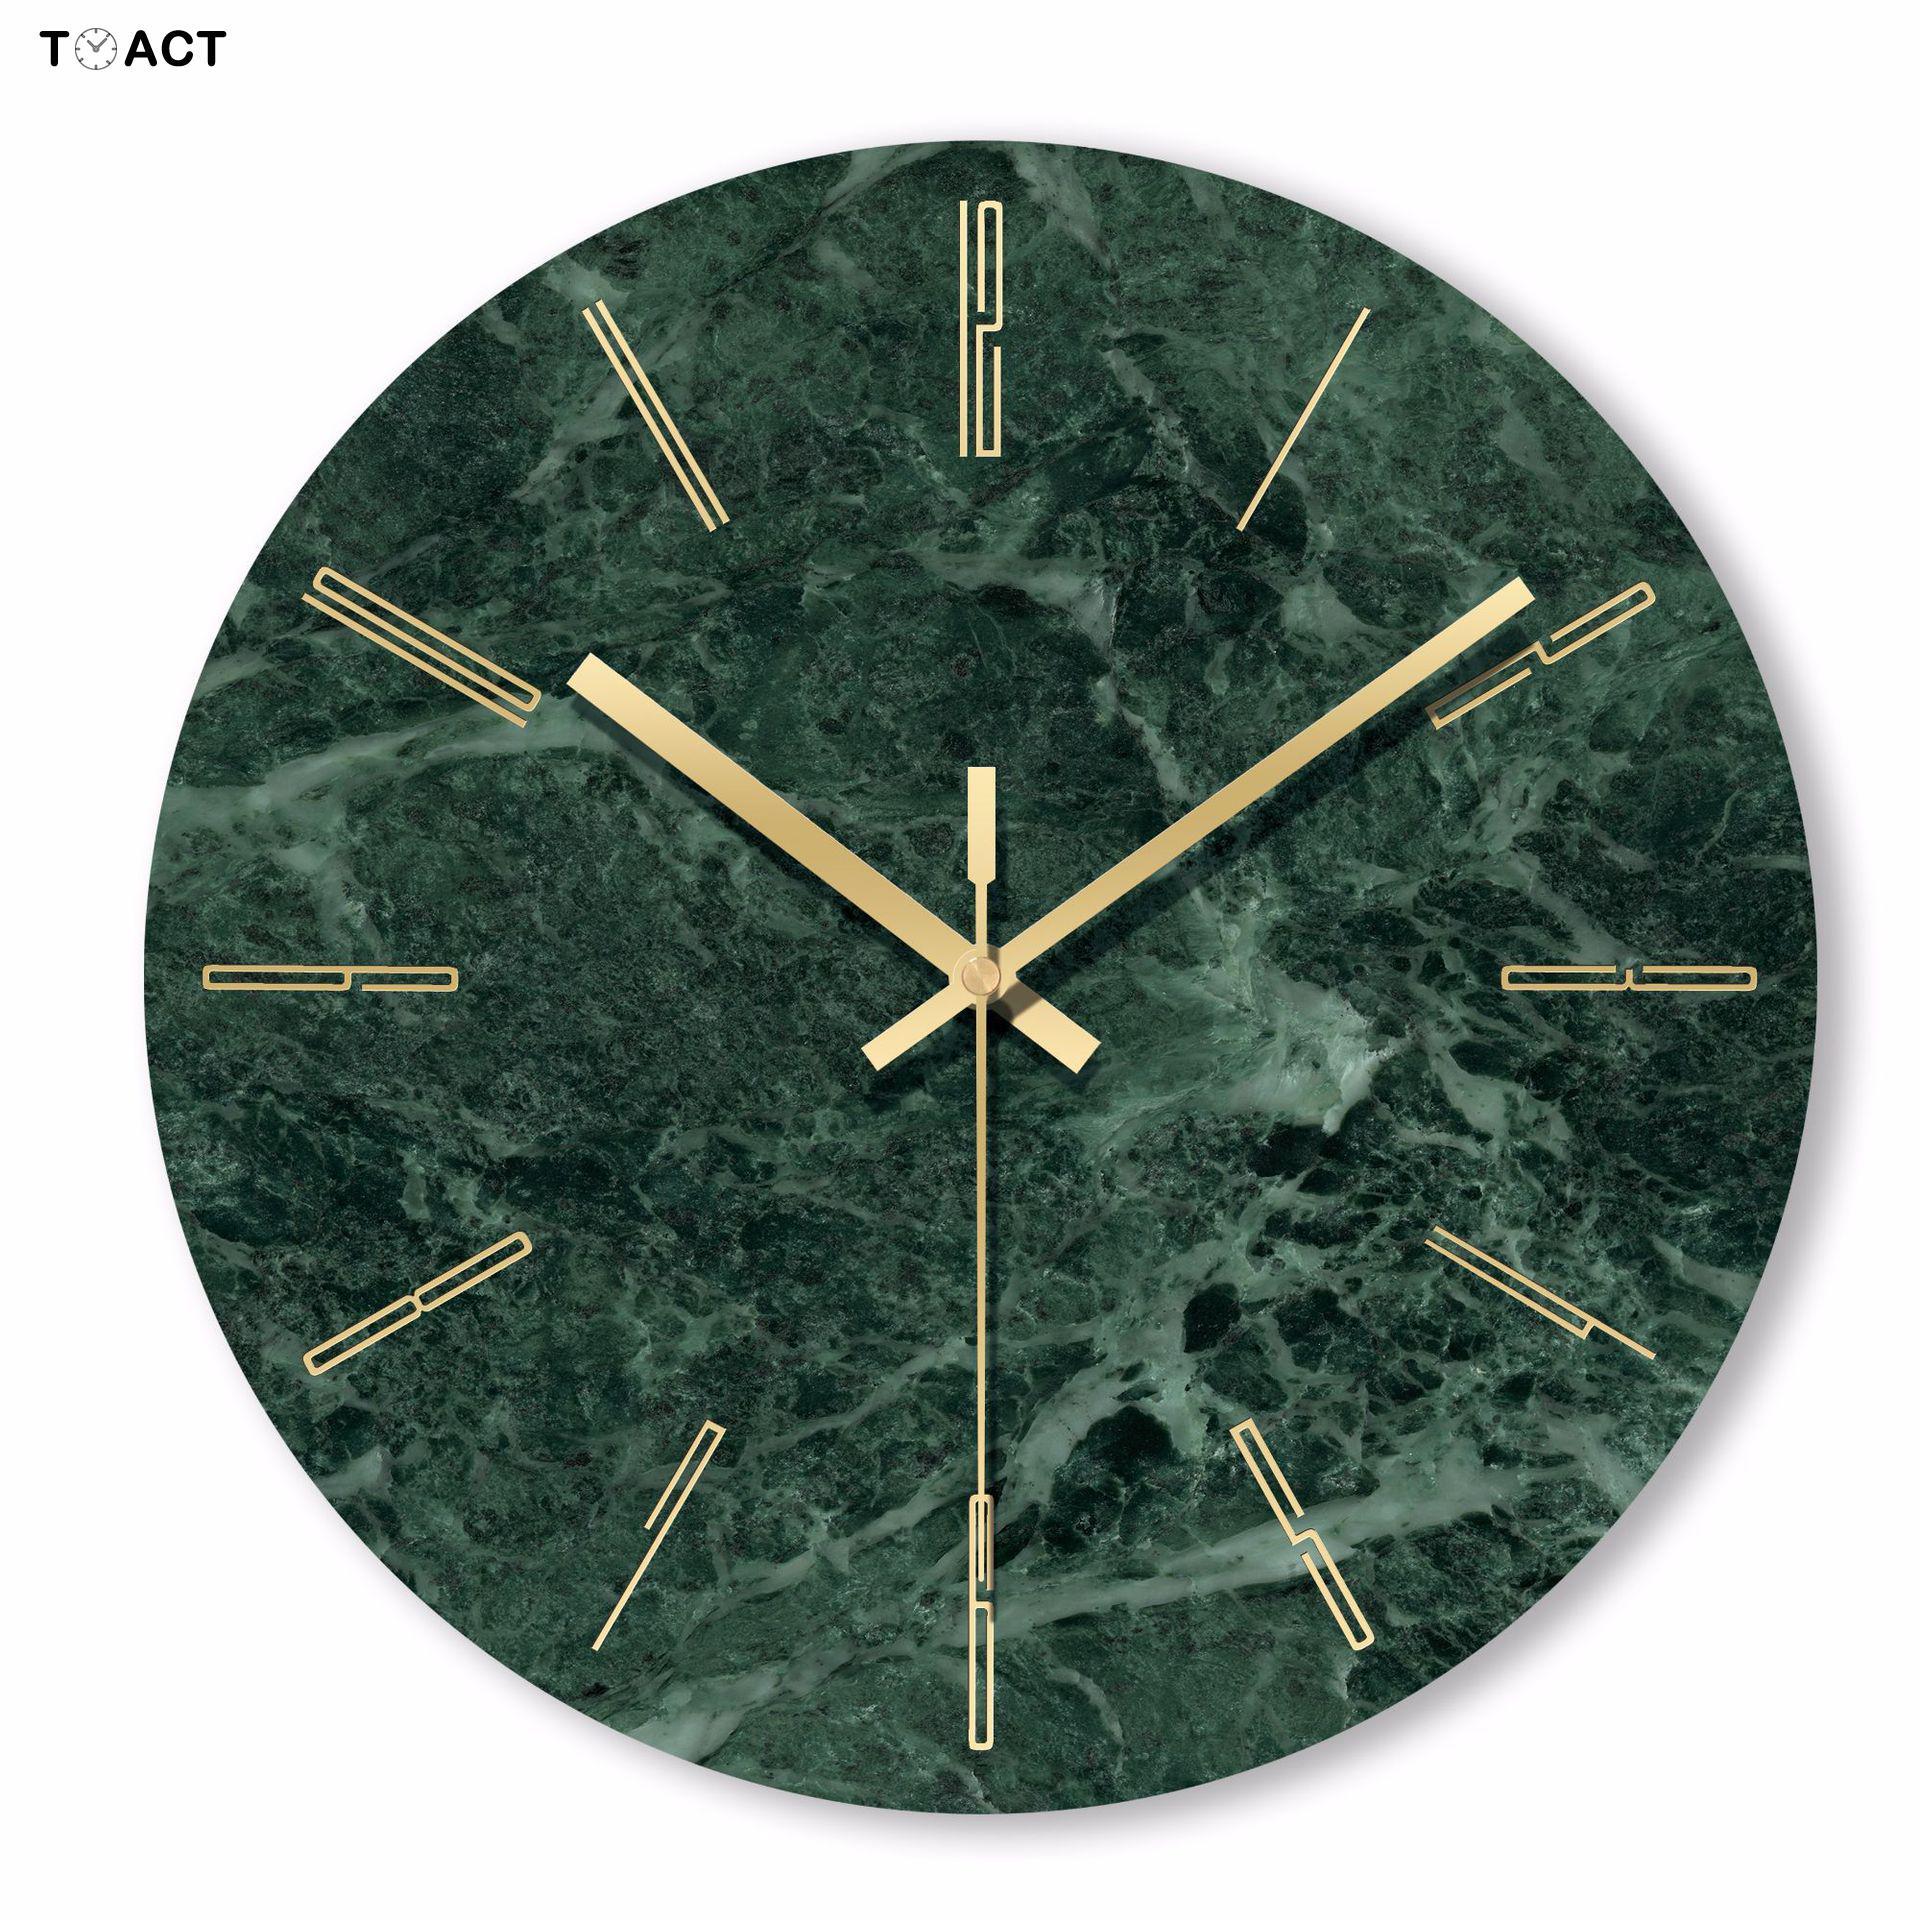 Reloj de pared moderno y nórdico para sala de estar, cronógrafo redondo...